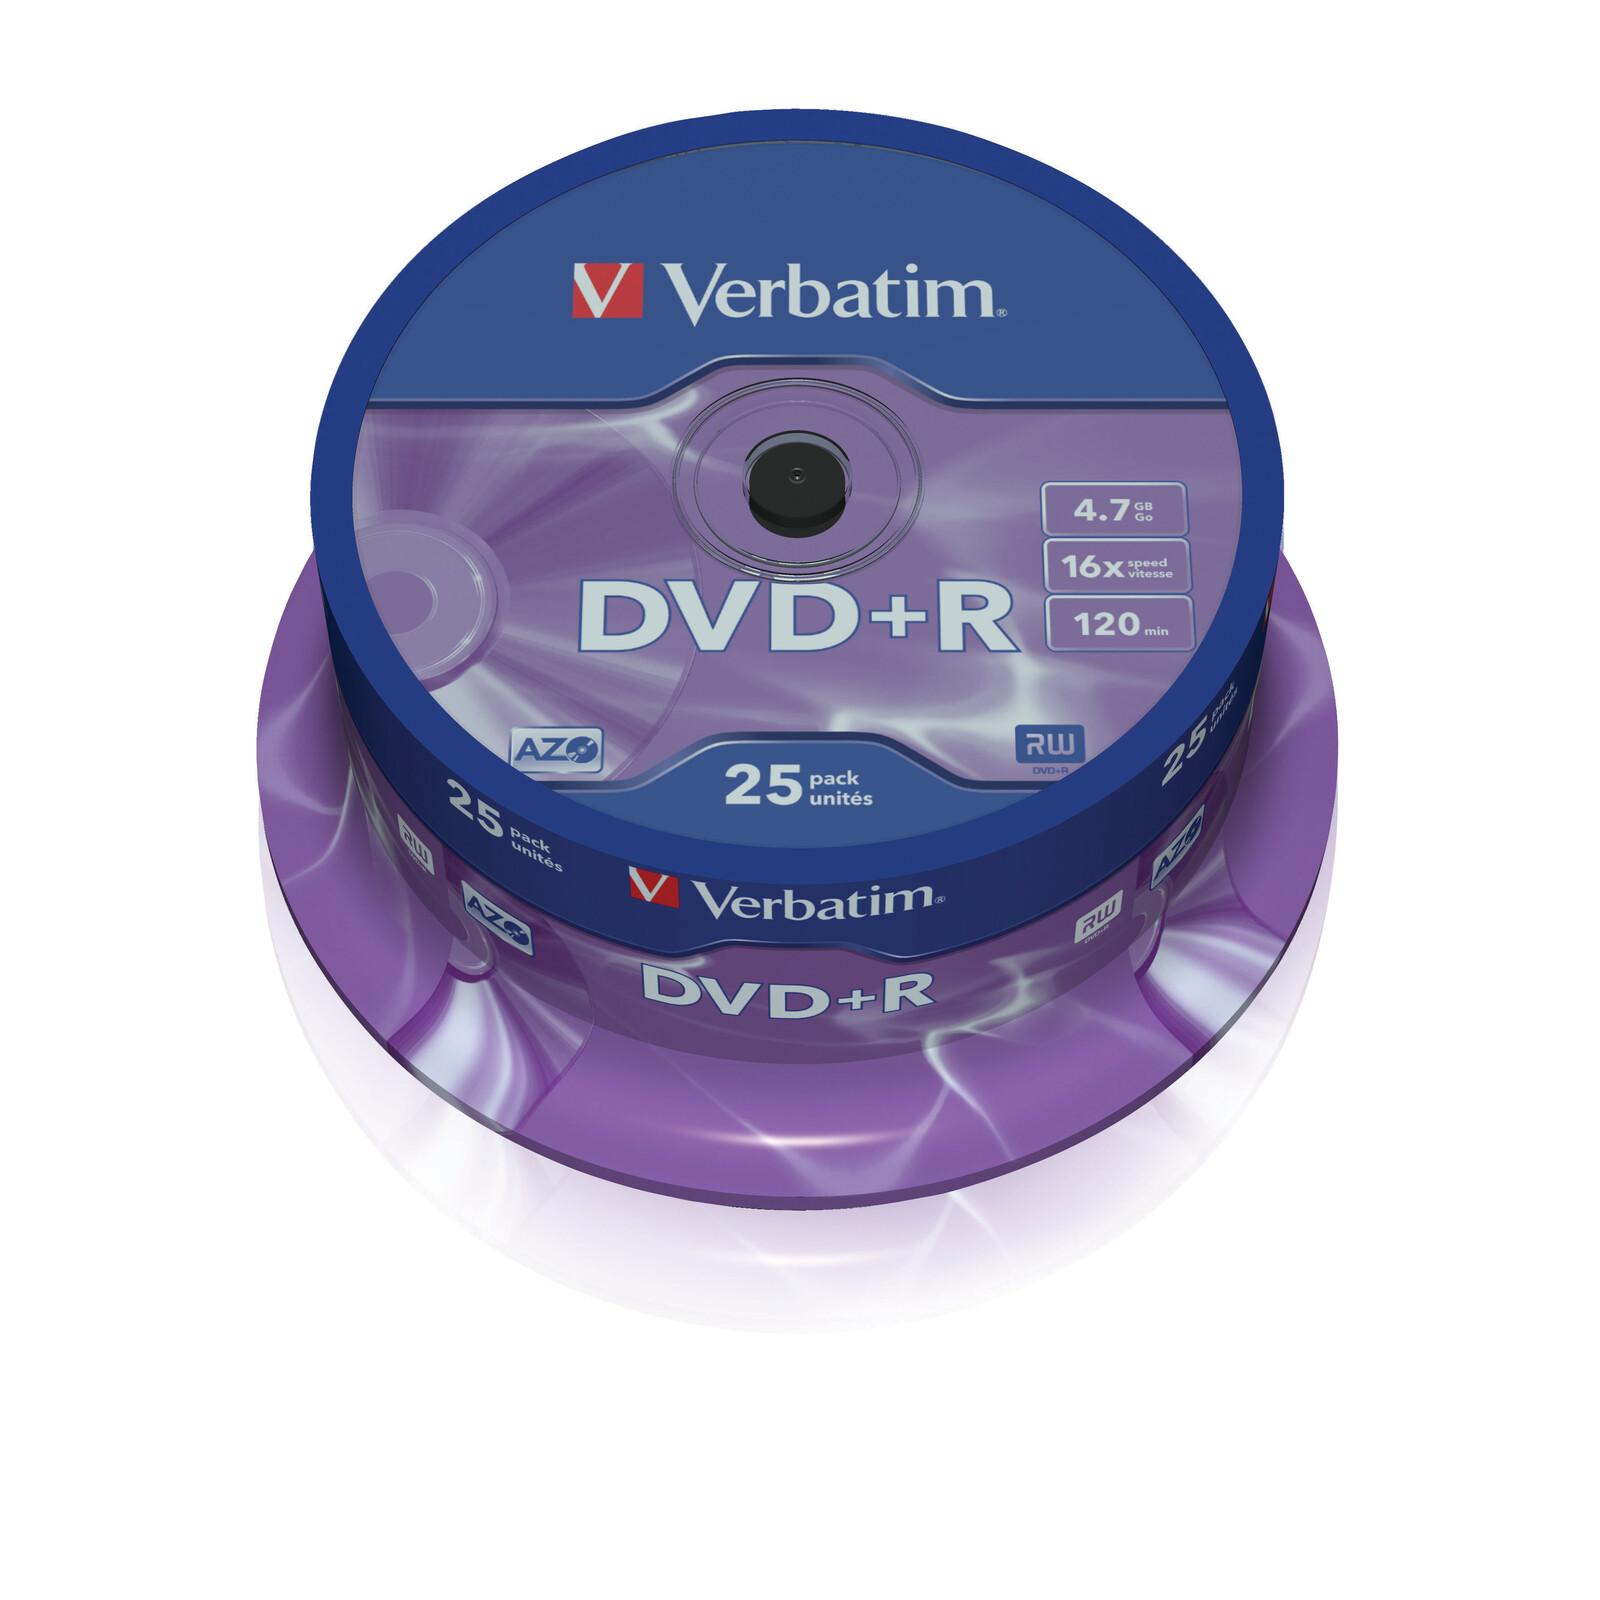 Verbatim DVD+R 4,7GB/16f Spindel 1x25